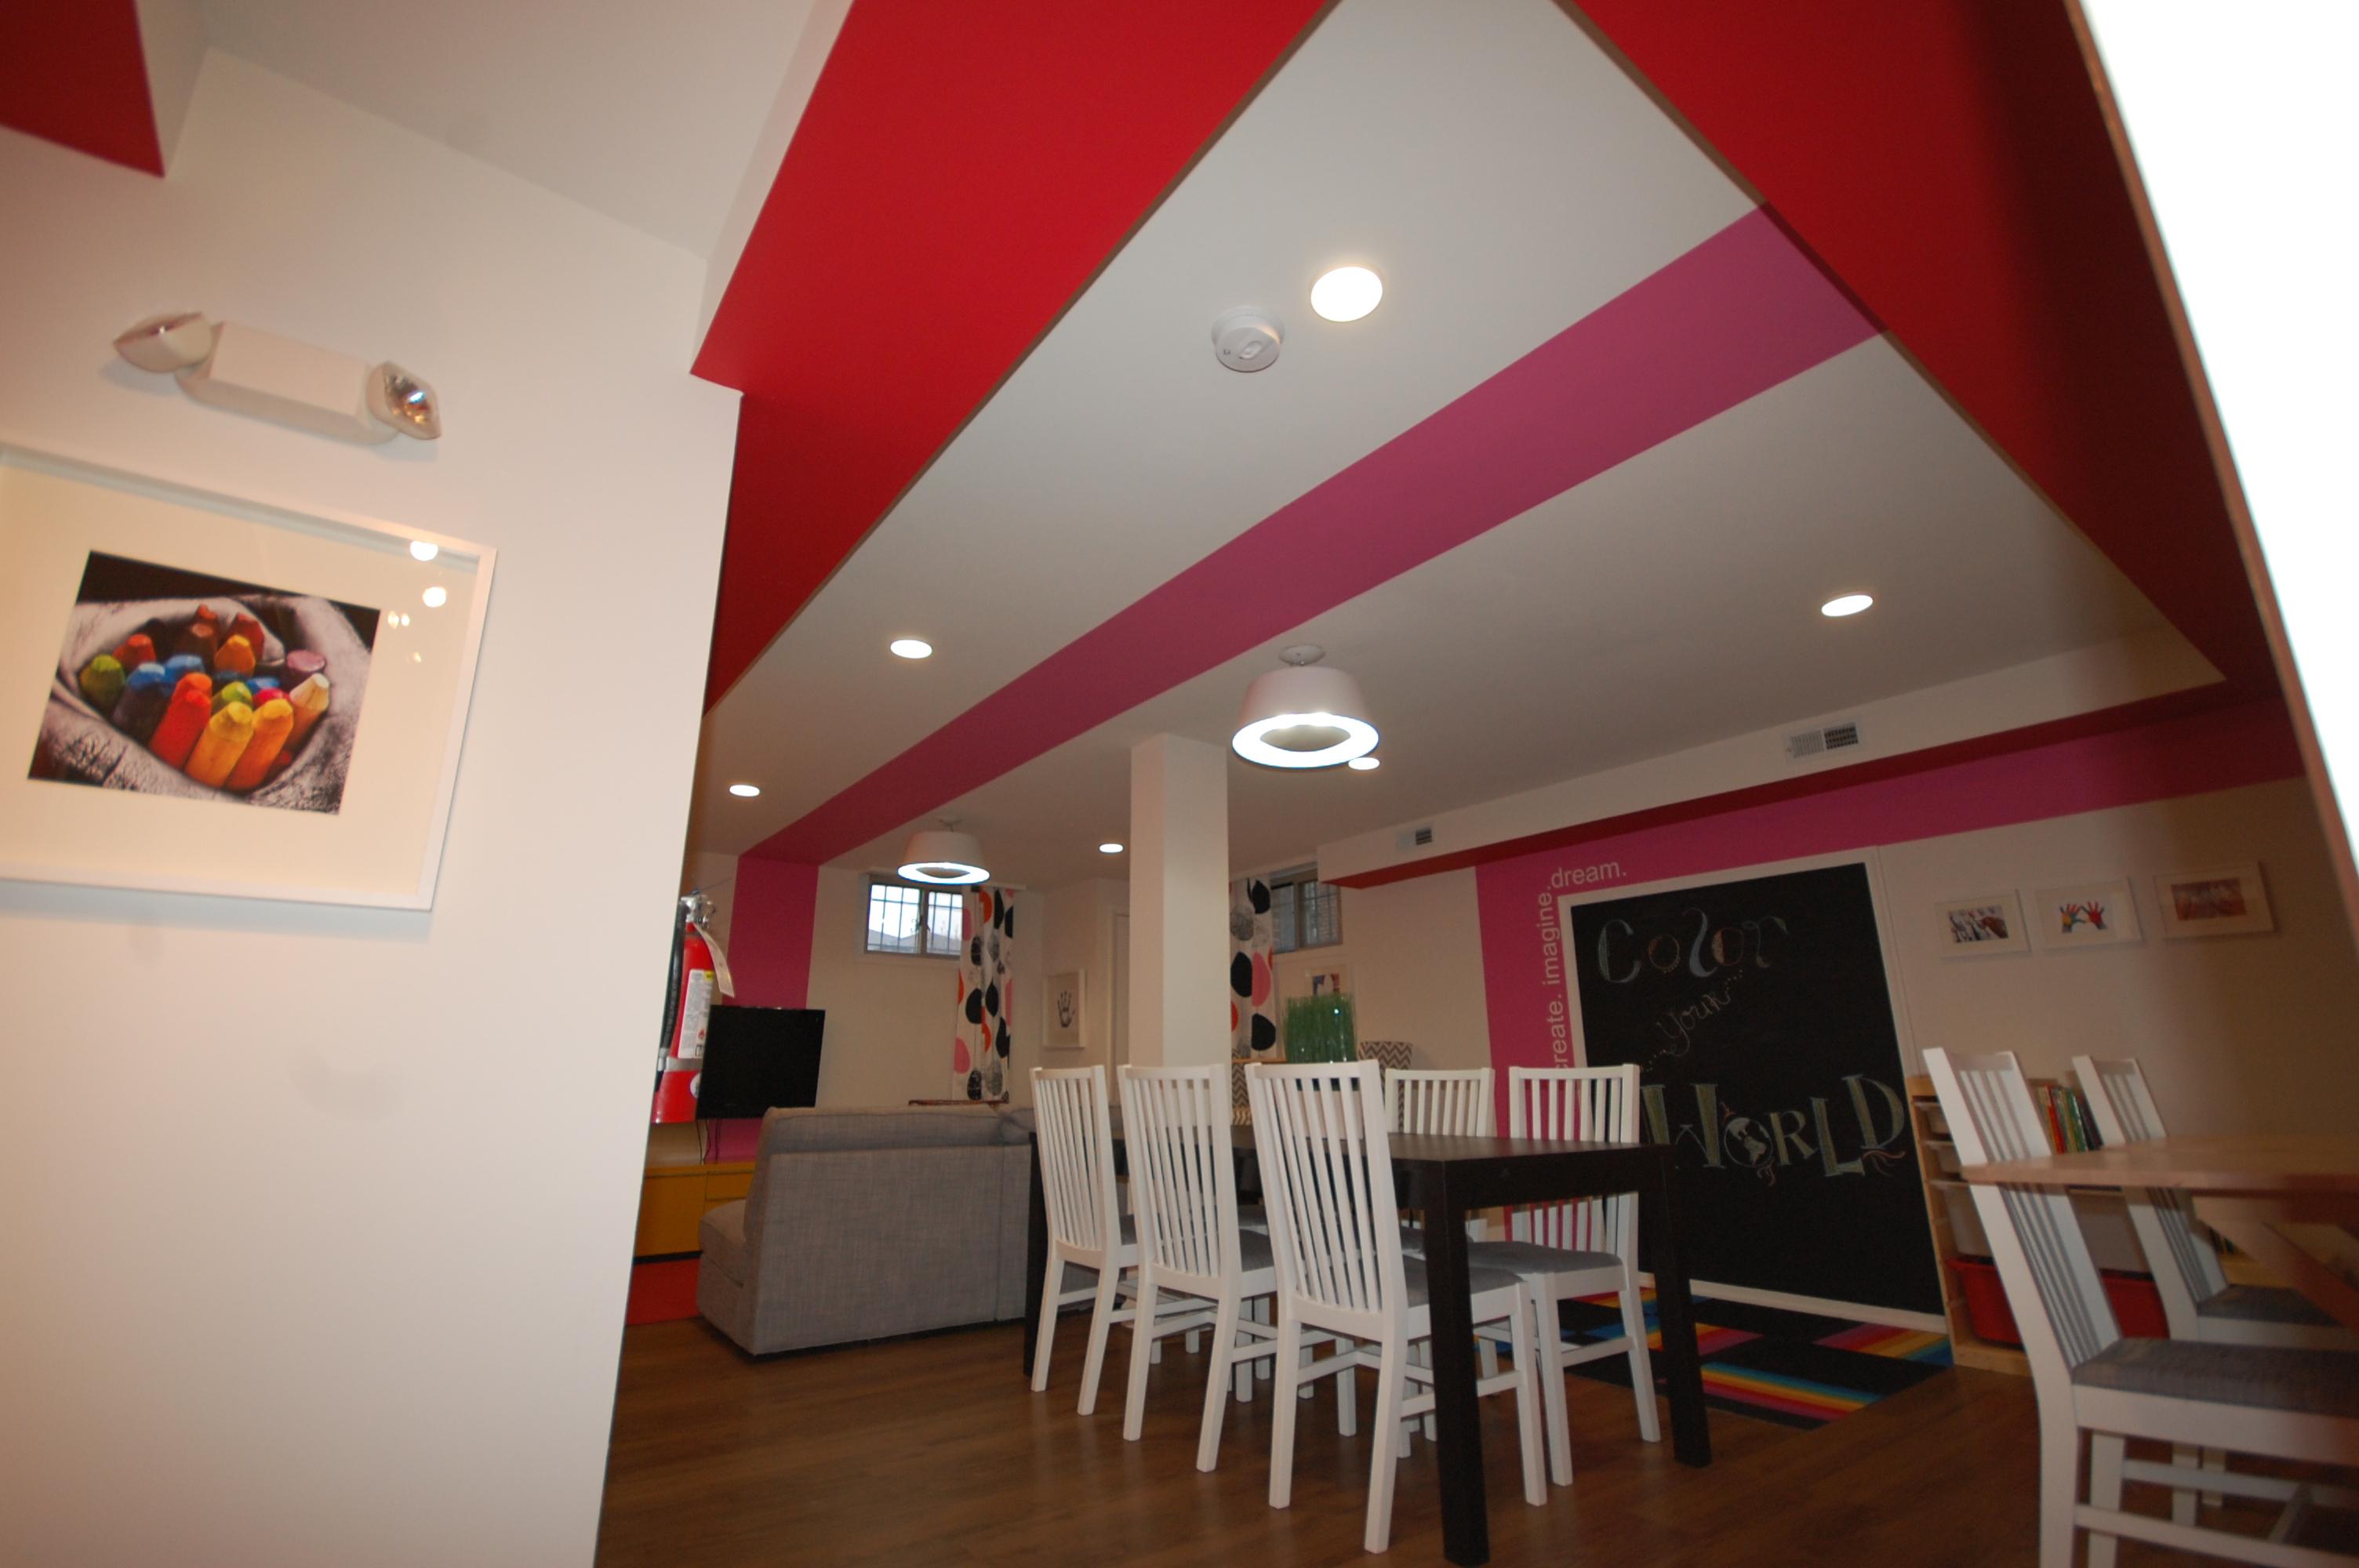 01 kids room Interior Designer Kia Weatherspoon Strives for 'Design Equity' in DC